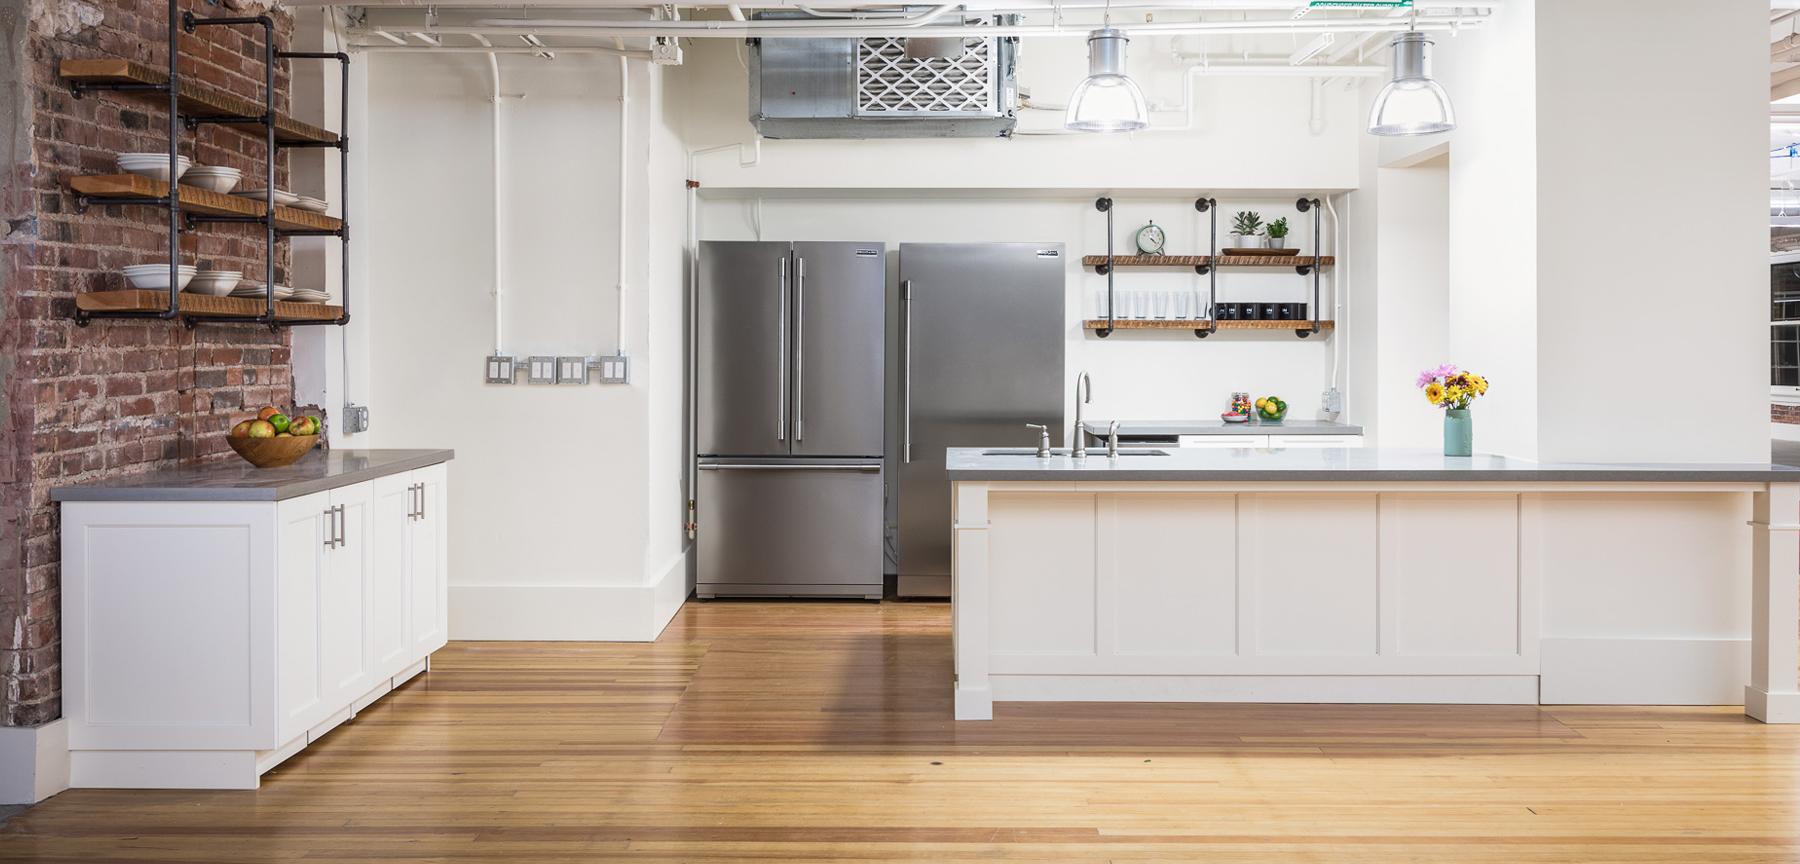 Inspirato office kitchen